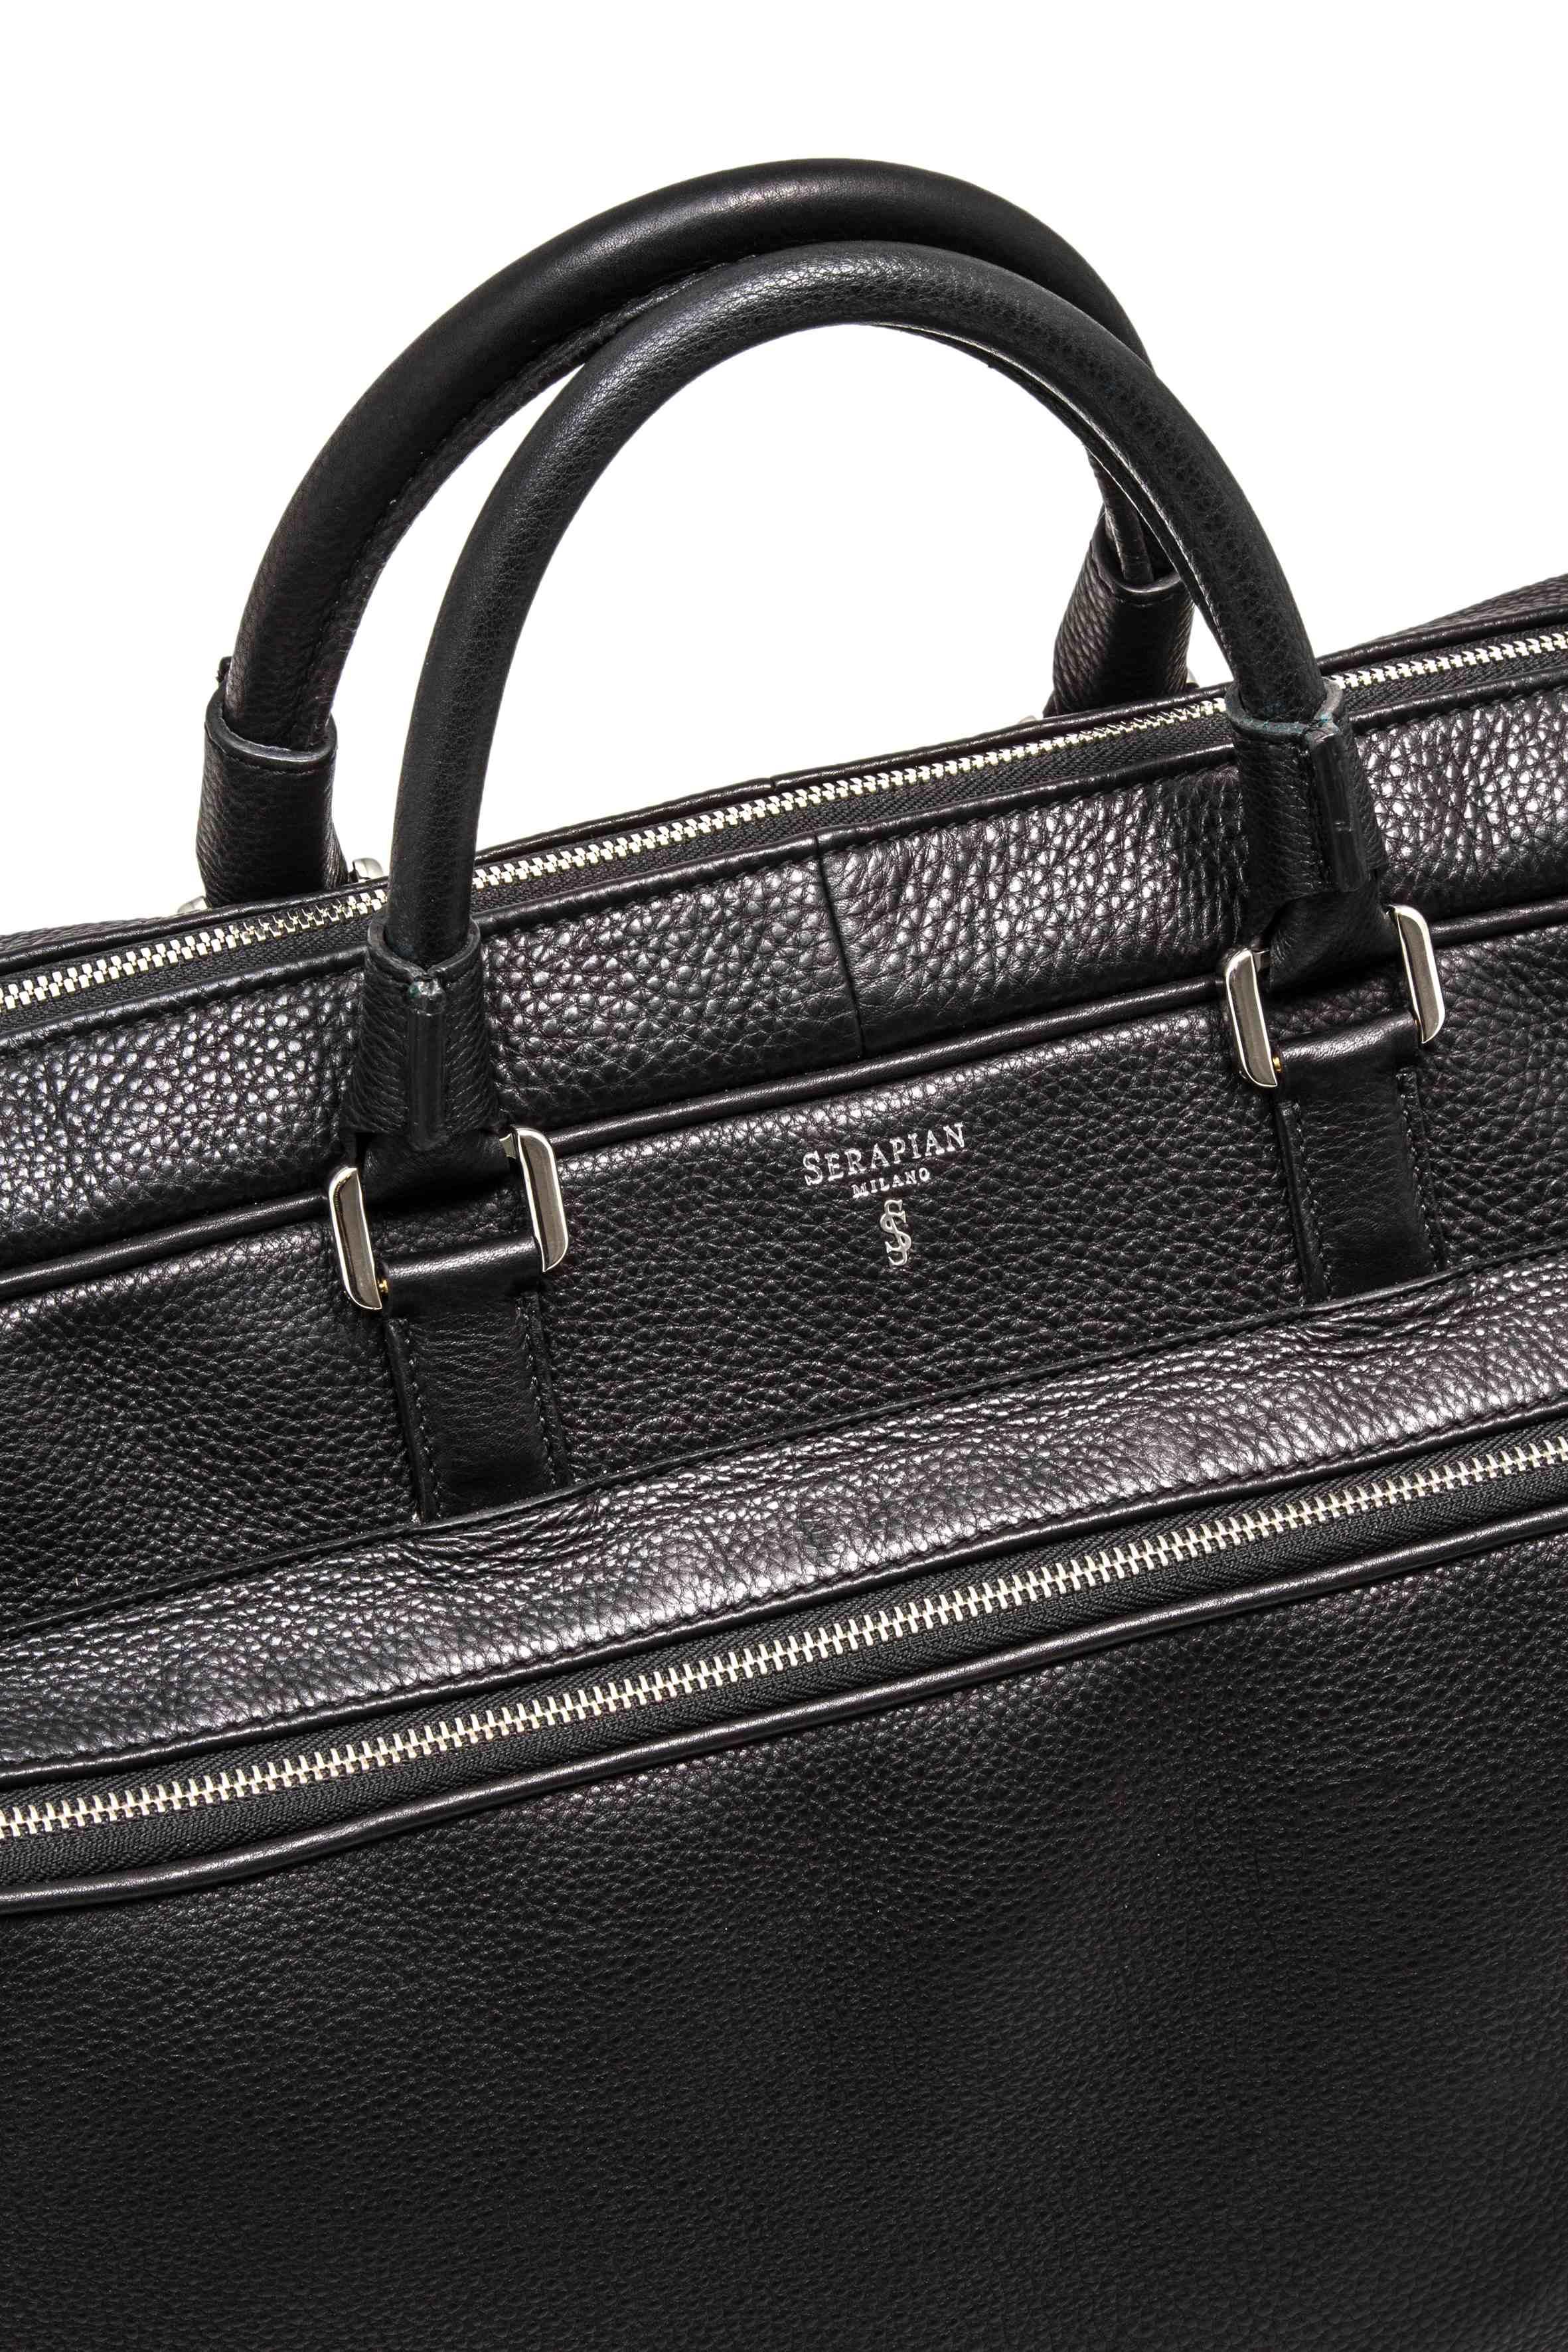 FW13 Product Review: SERAPIAN Cashmere Collection 24hr Men's